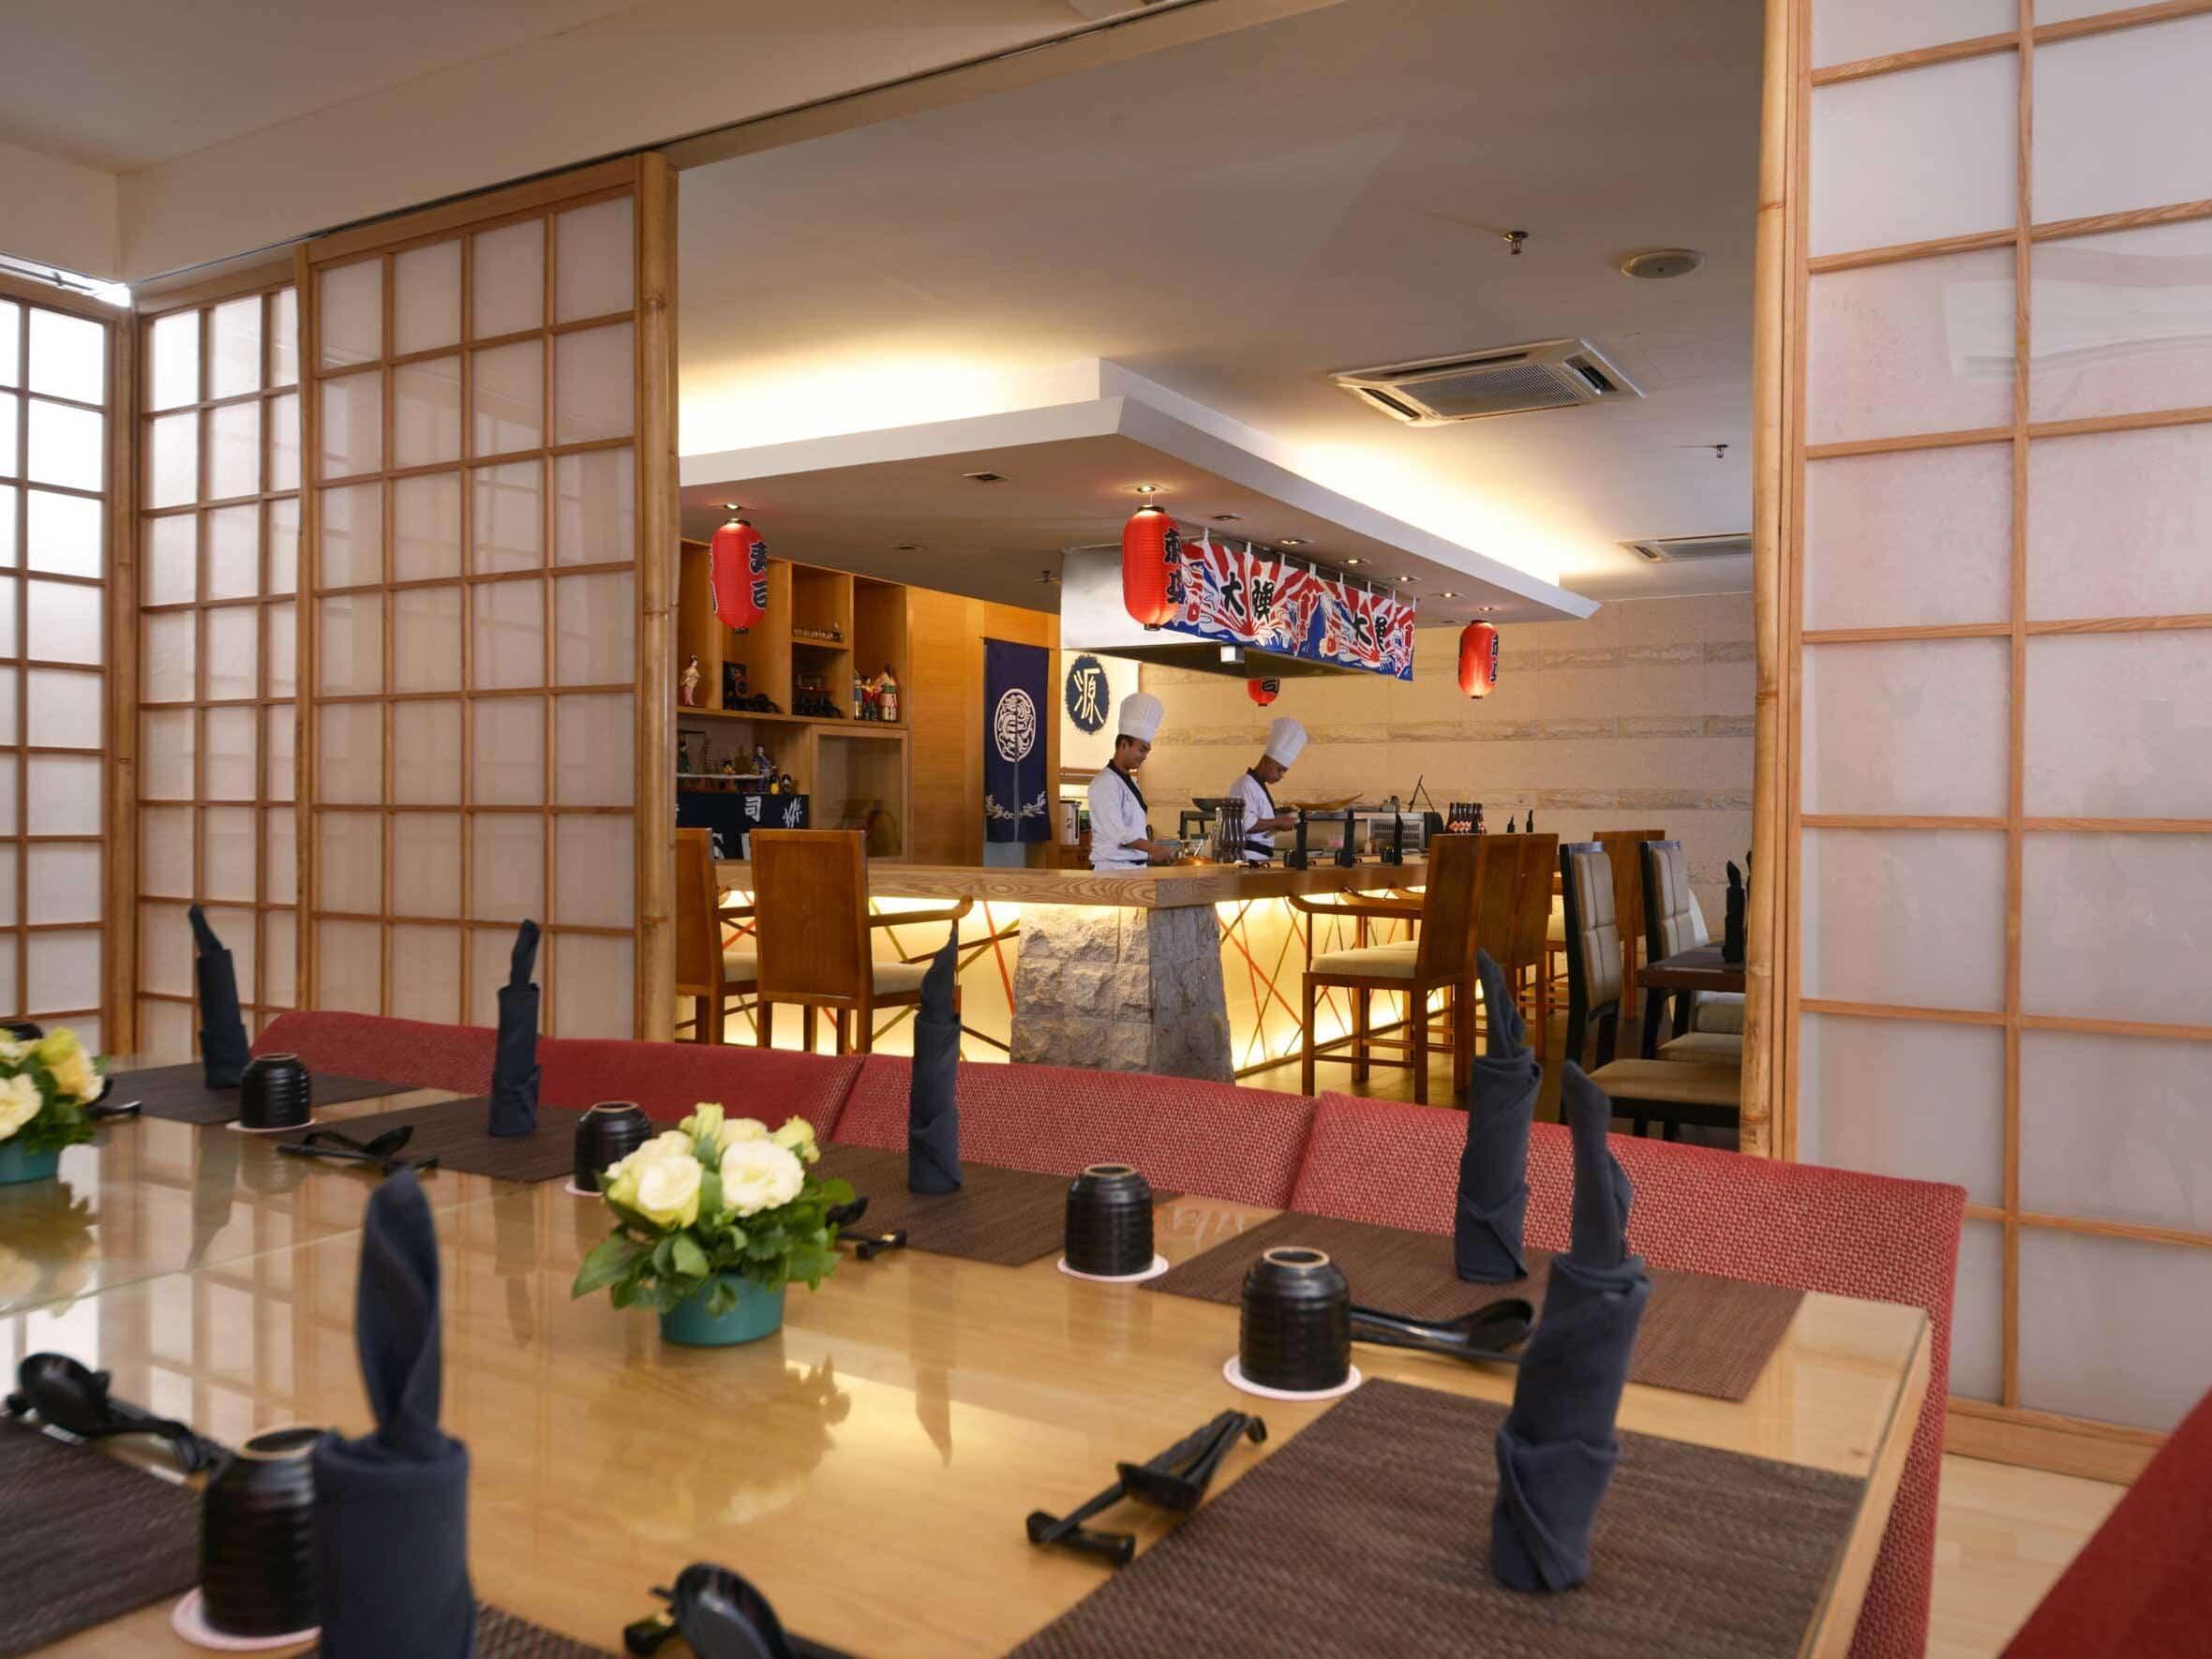 UMI Japanese Restaurant view 1